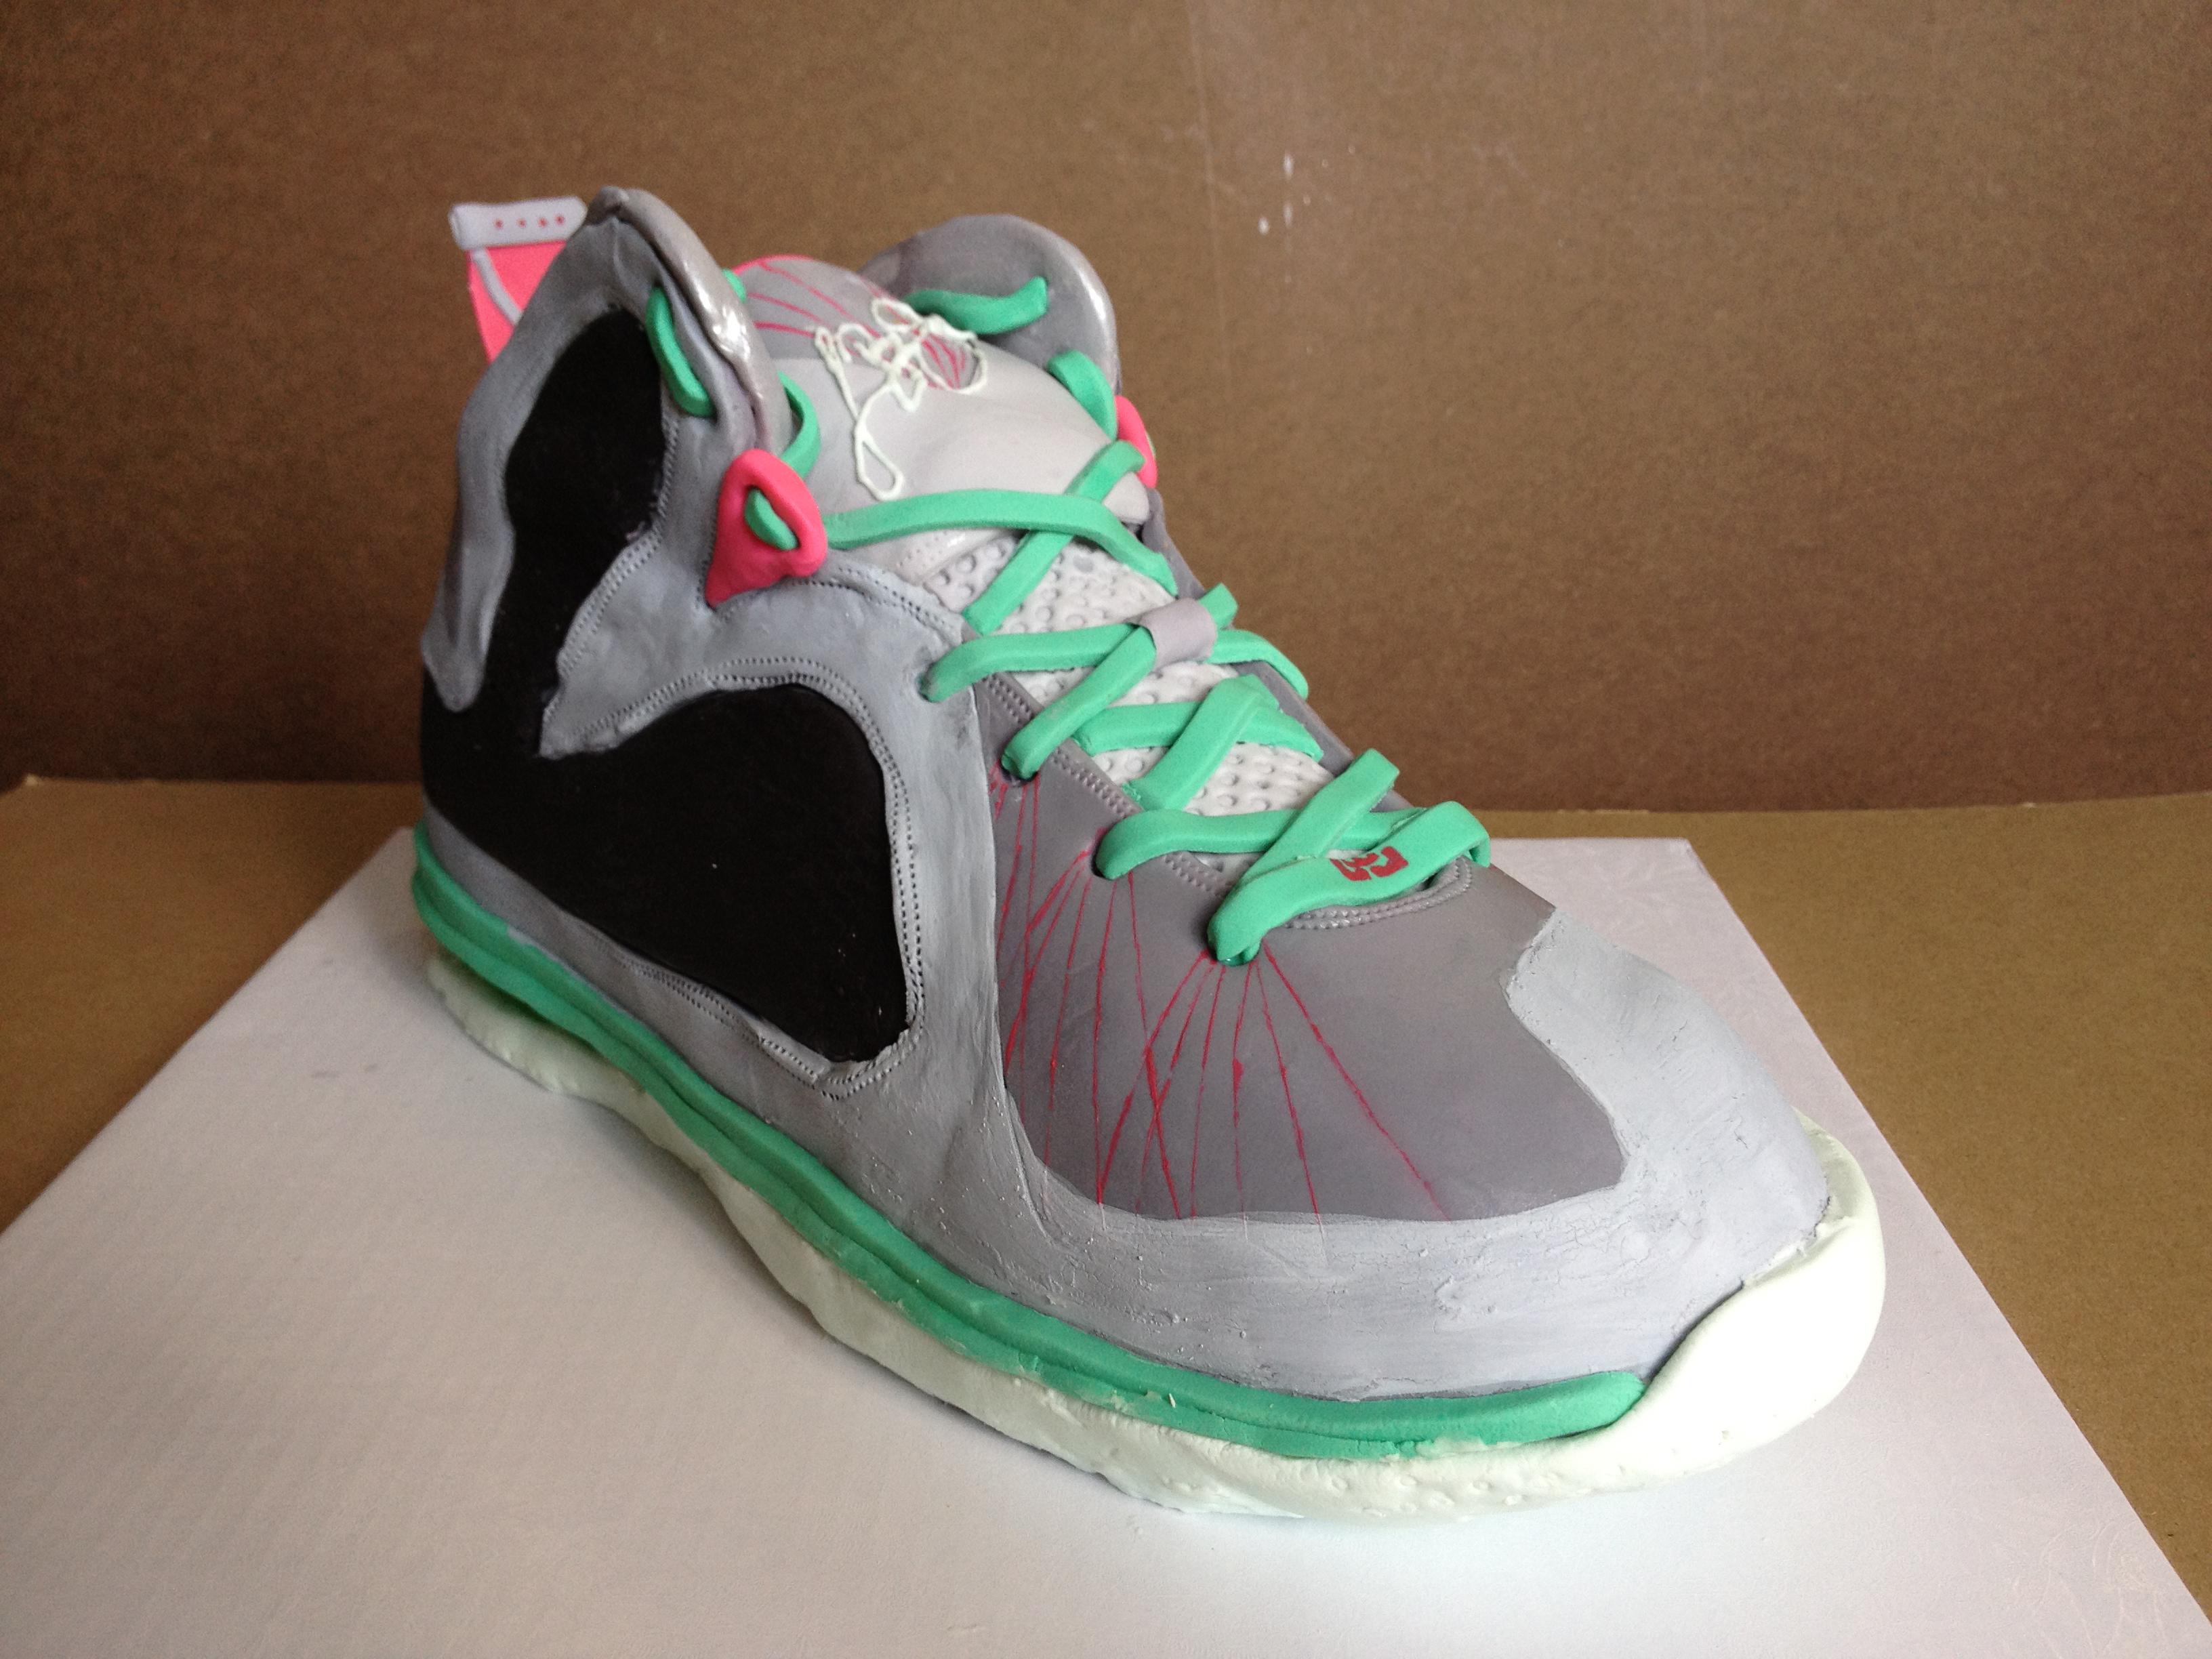 Lebron sneaker Nike LeBron 9 Elite GS Miami Vice Sneaker Cake